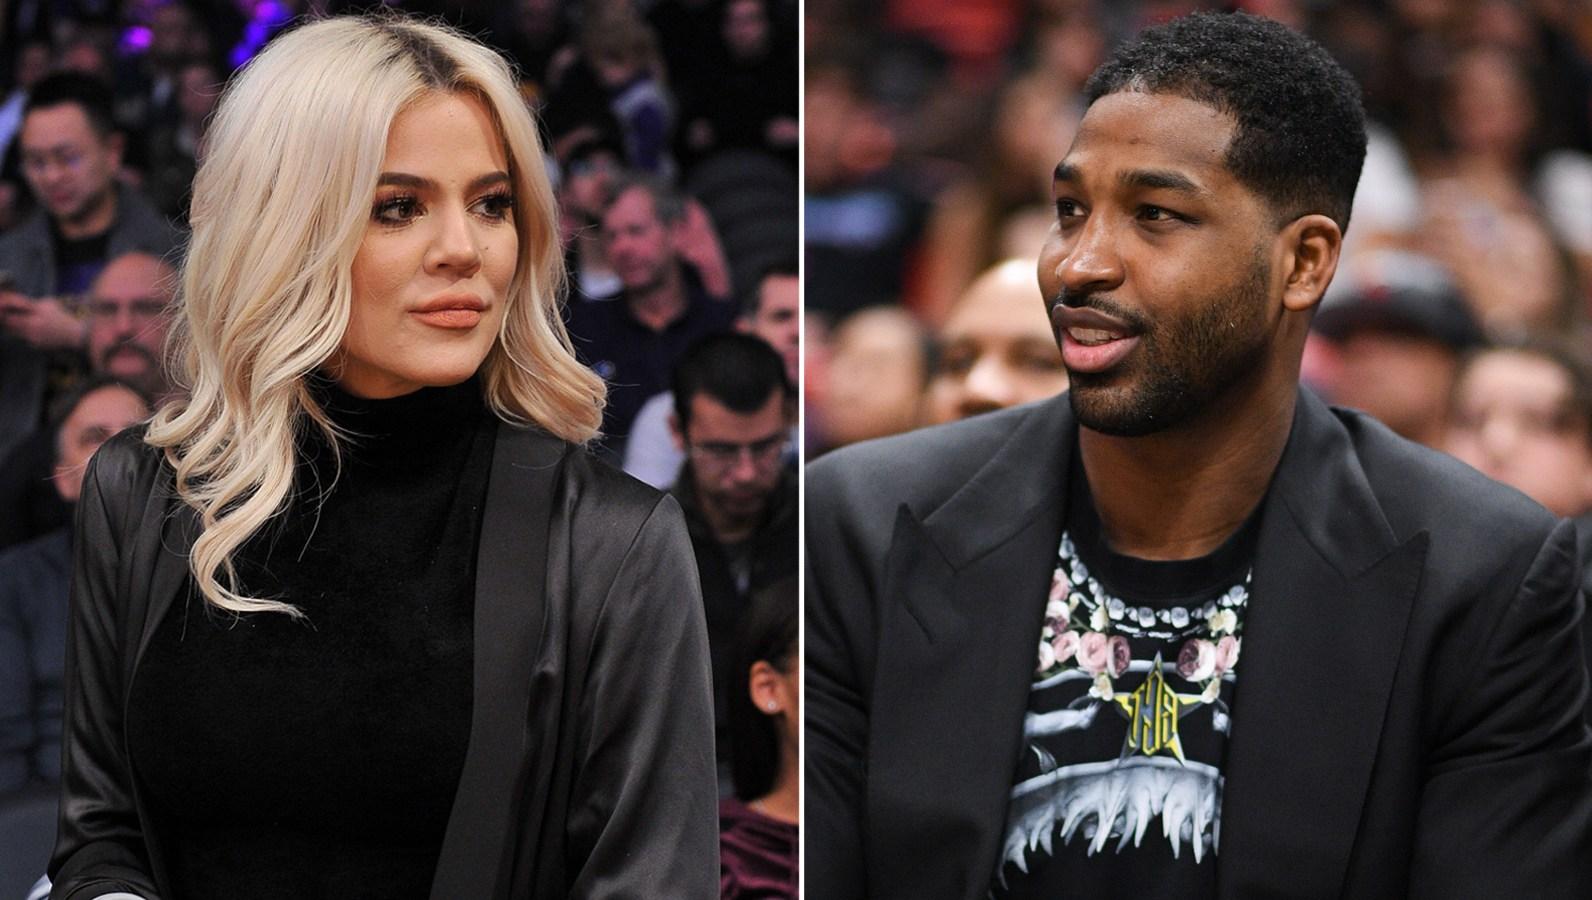 Khloé Kardashian Drops Not-So-Subtle Message to Tristan Thompson on Instagram